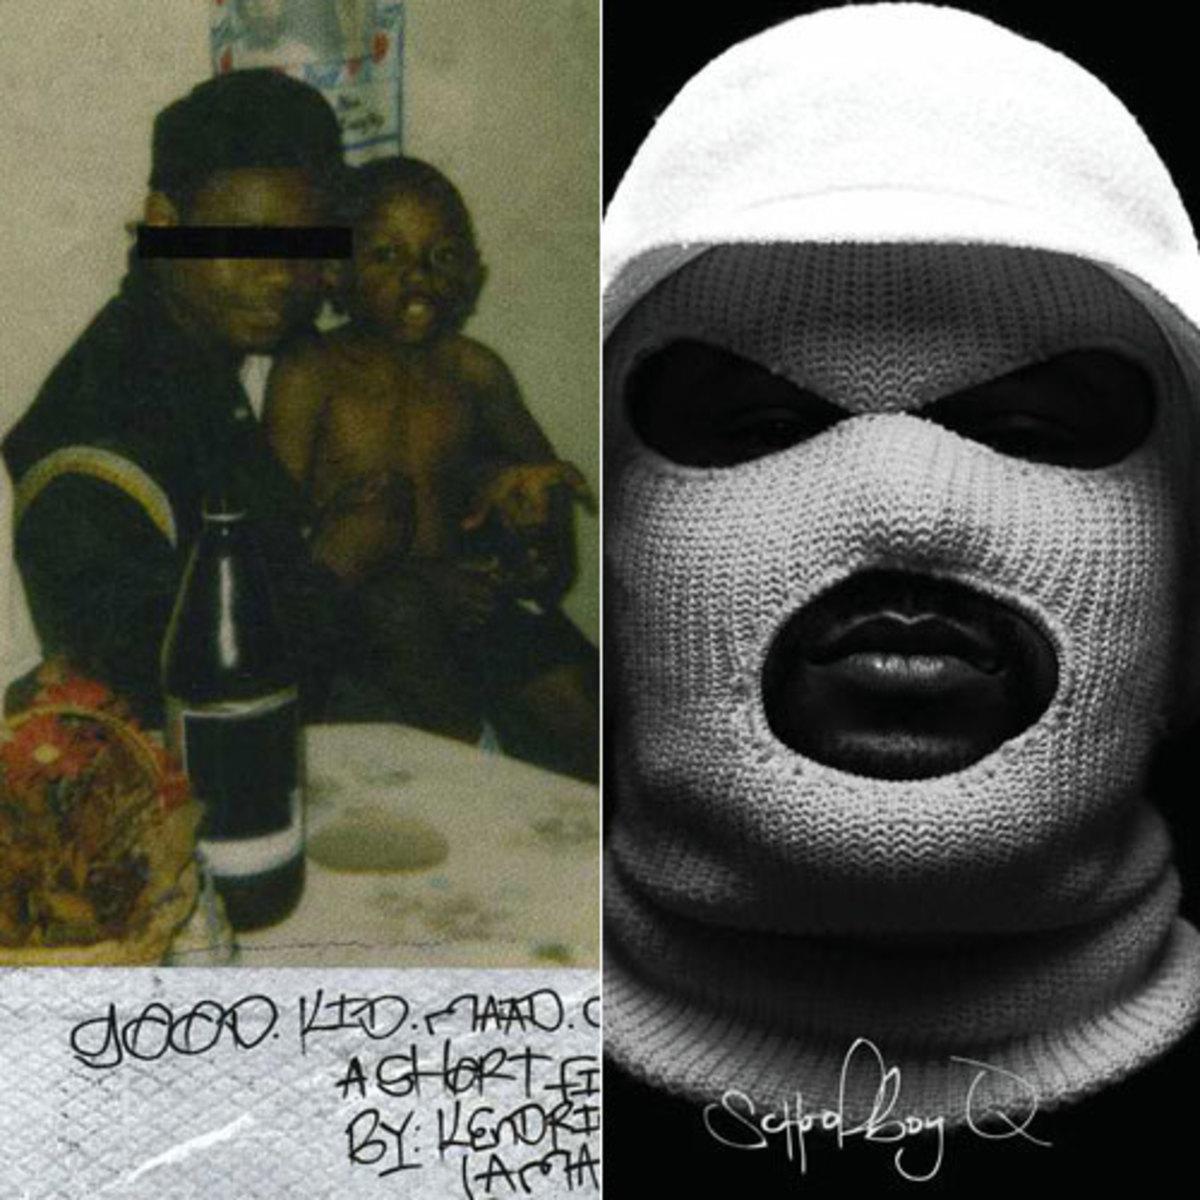 best-hh-album-kdot-v-q.jpg